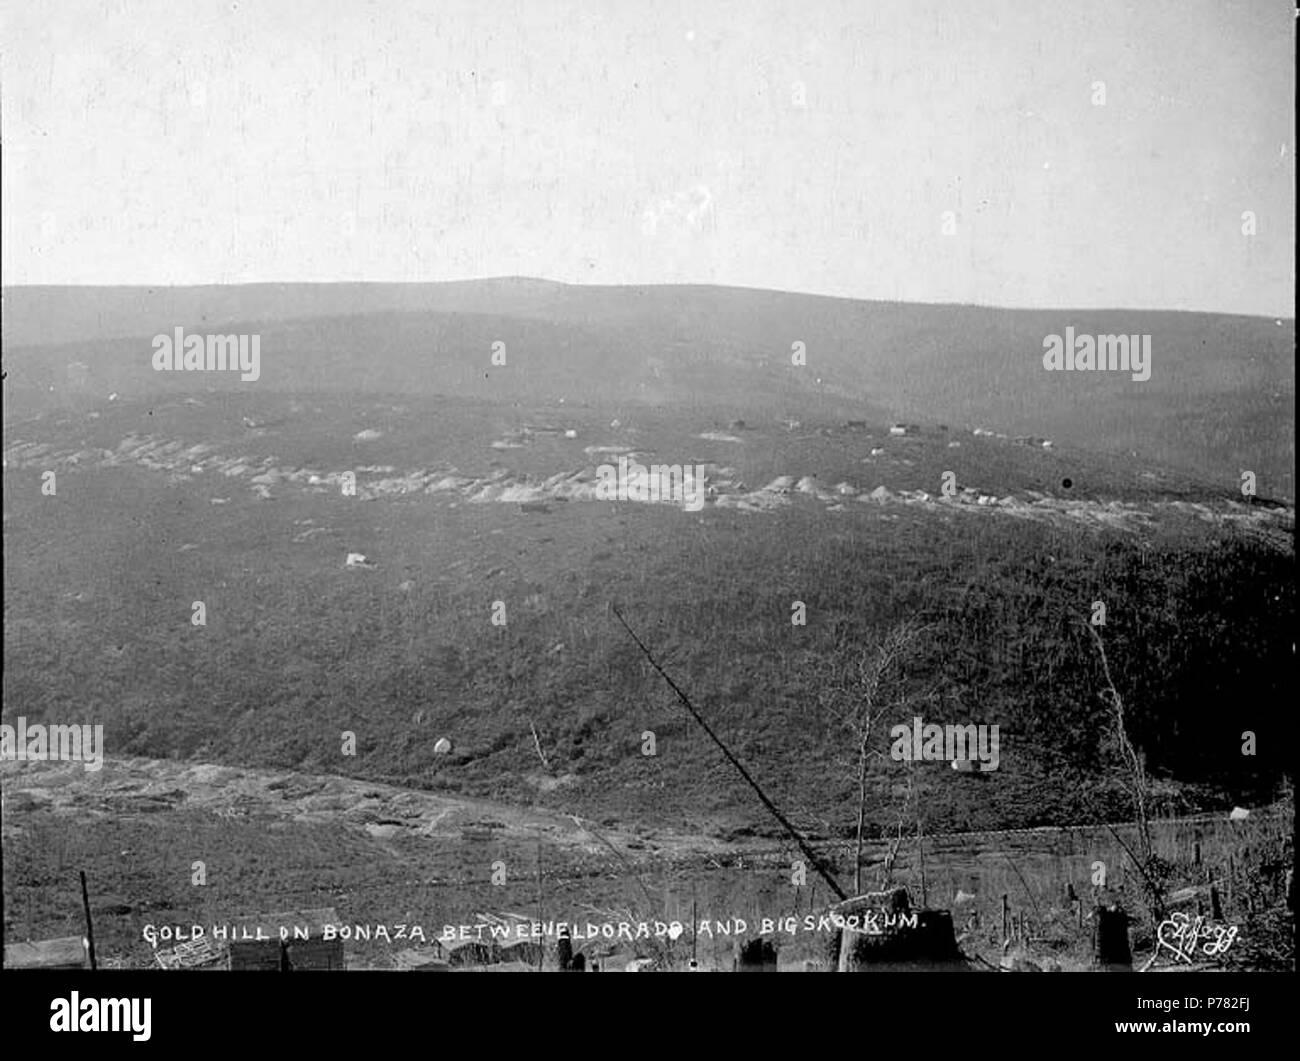 . English: Panorama of mining claims on Gold Hill showing Bonanza Creek, Yukon Territory, ca. 1898. English: Caption on image: 'Gold Hill on Bonanza between Eldorado and Big Skookum' Klondike Gold Rush. Subjects (LCTGM): Mining claims--Yukon--Gold Hill Subjects (LCSH): Gold Hill (Yukon)  . circa 1898 10 Panorama of mining claims on Gold Hill showing Bonanza Creek, Yukon Territory, ca 1898 (HEGG 524) - Stock Image